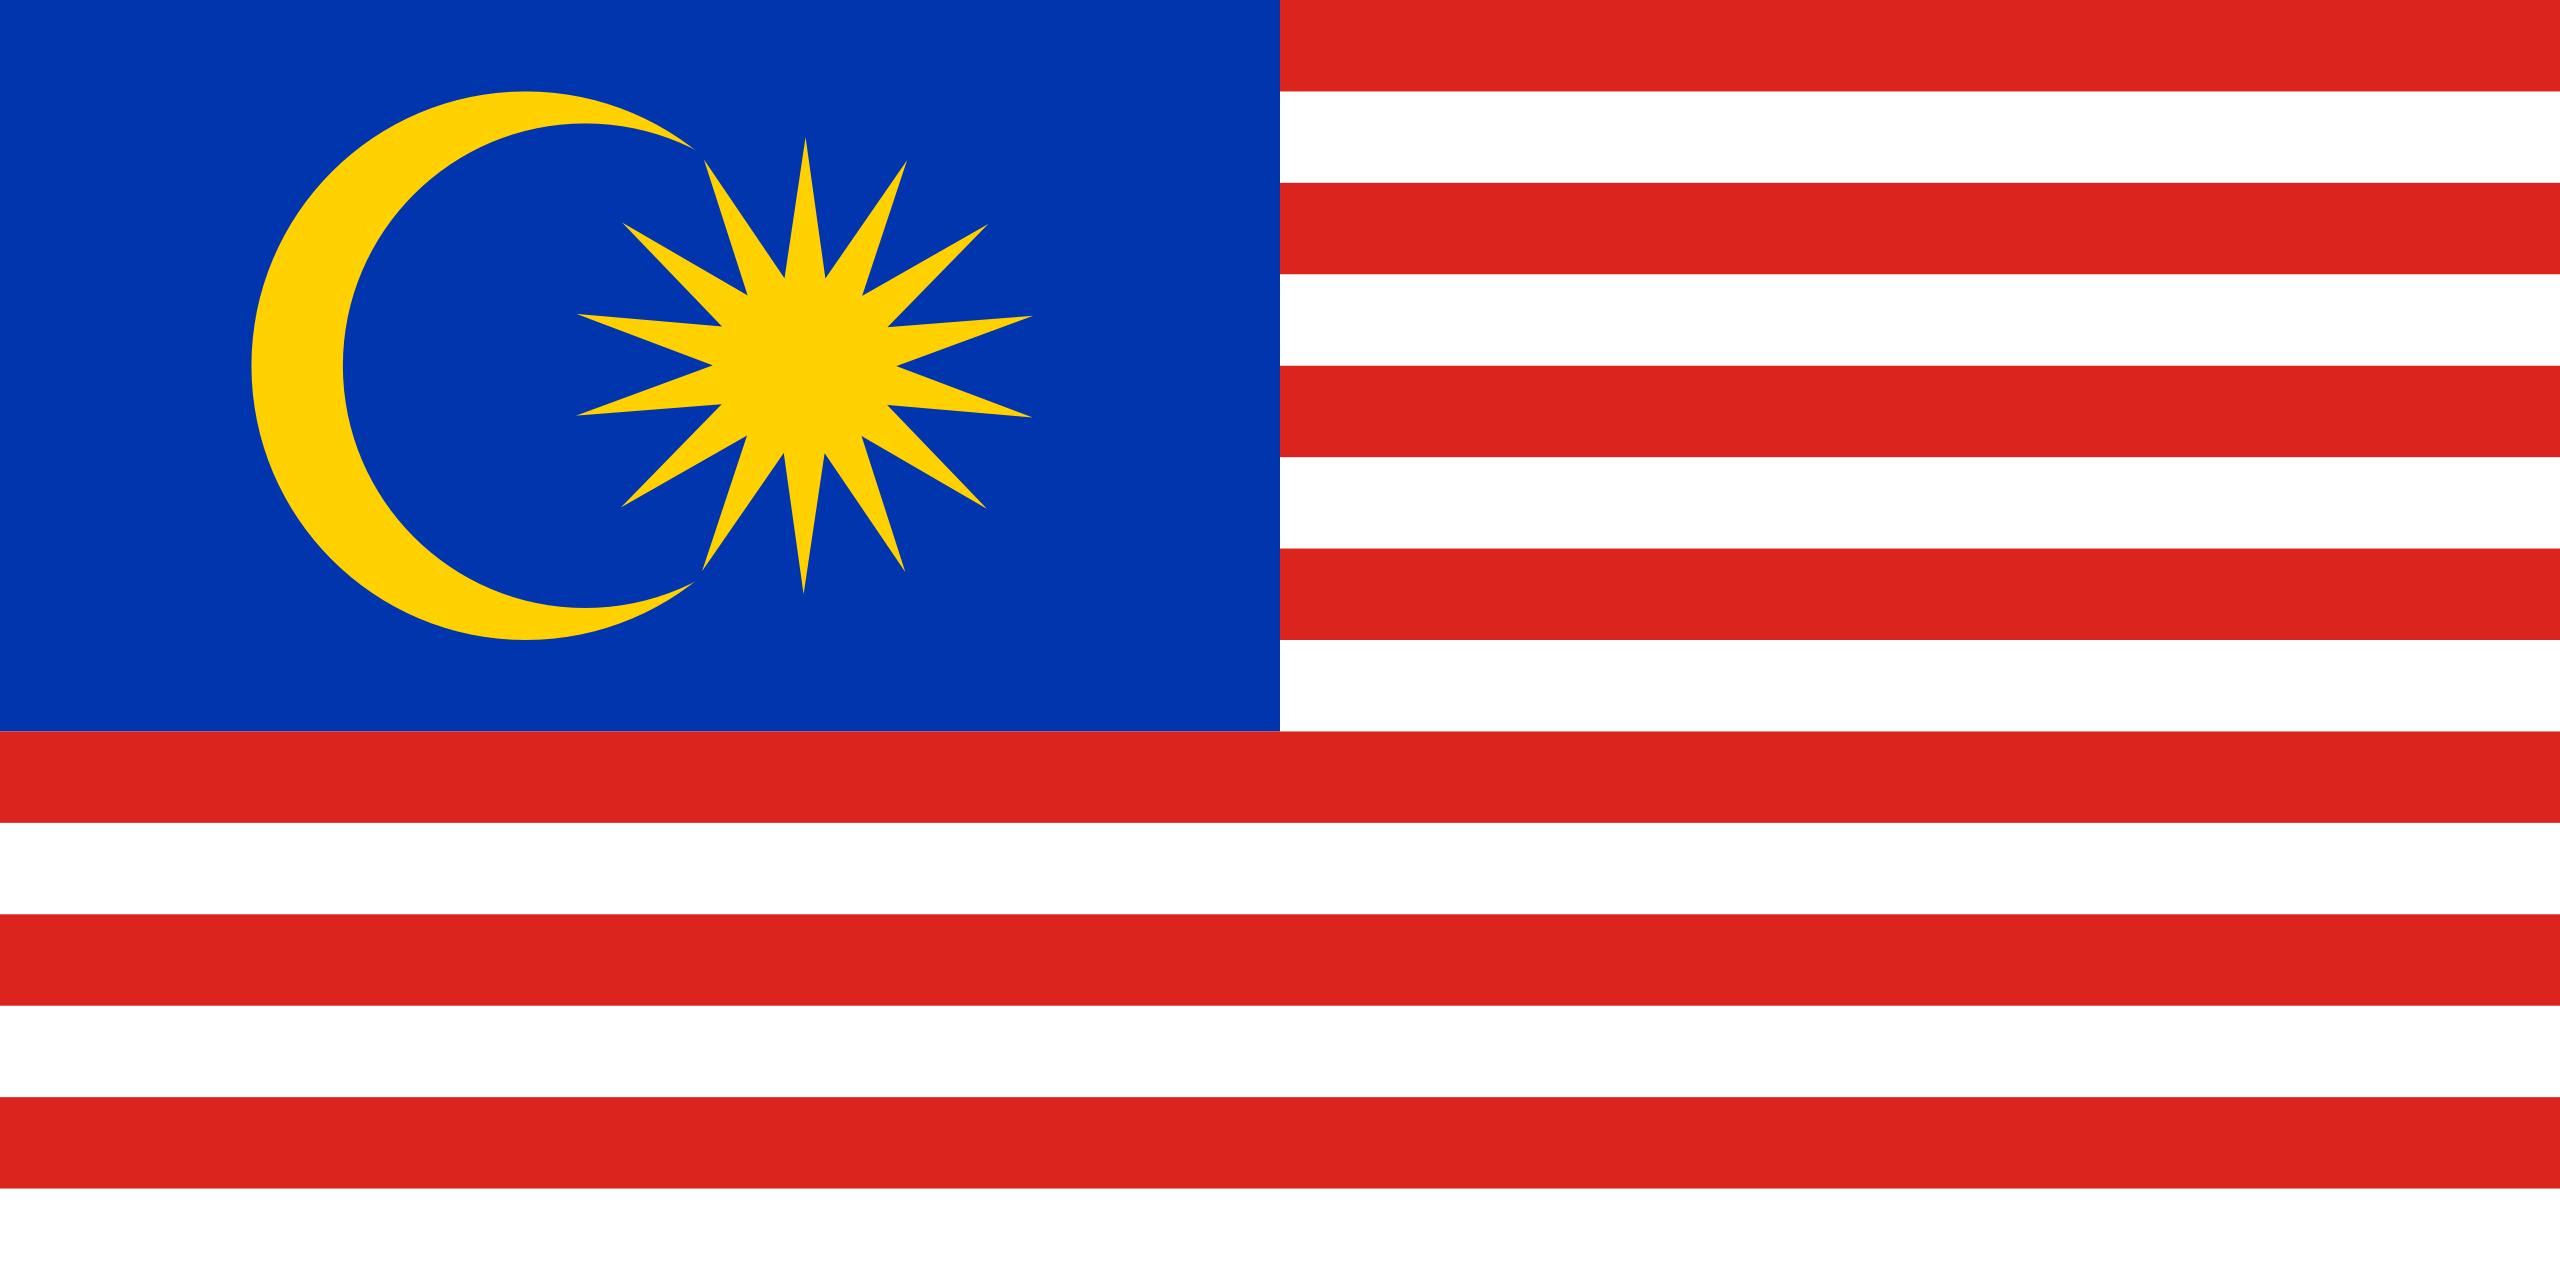 Malaysien, Land, Emblem, Logo, Symbol - Wallpaper HD - Prof.-falken.com